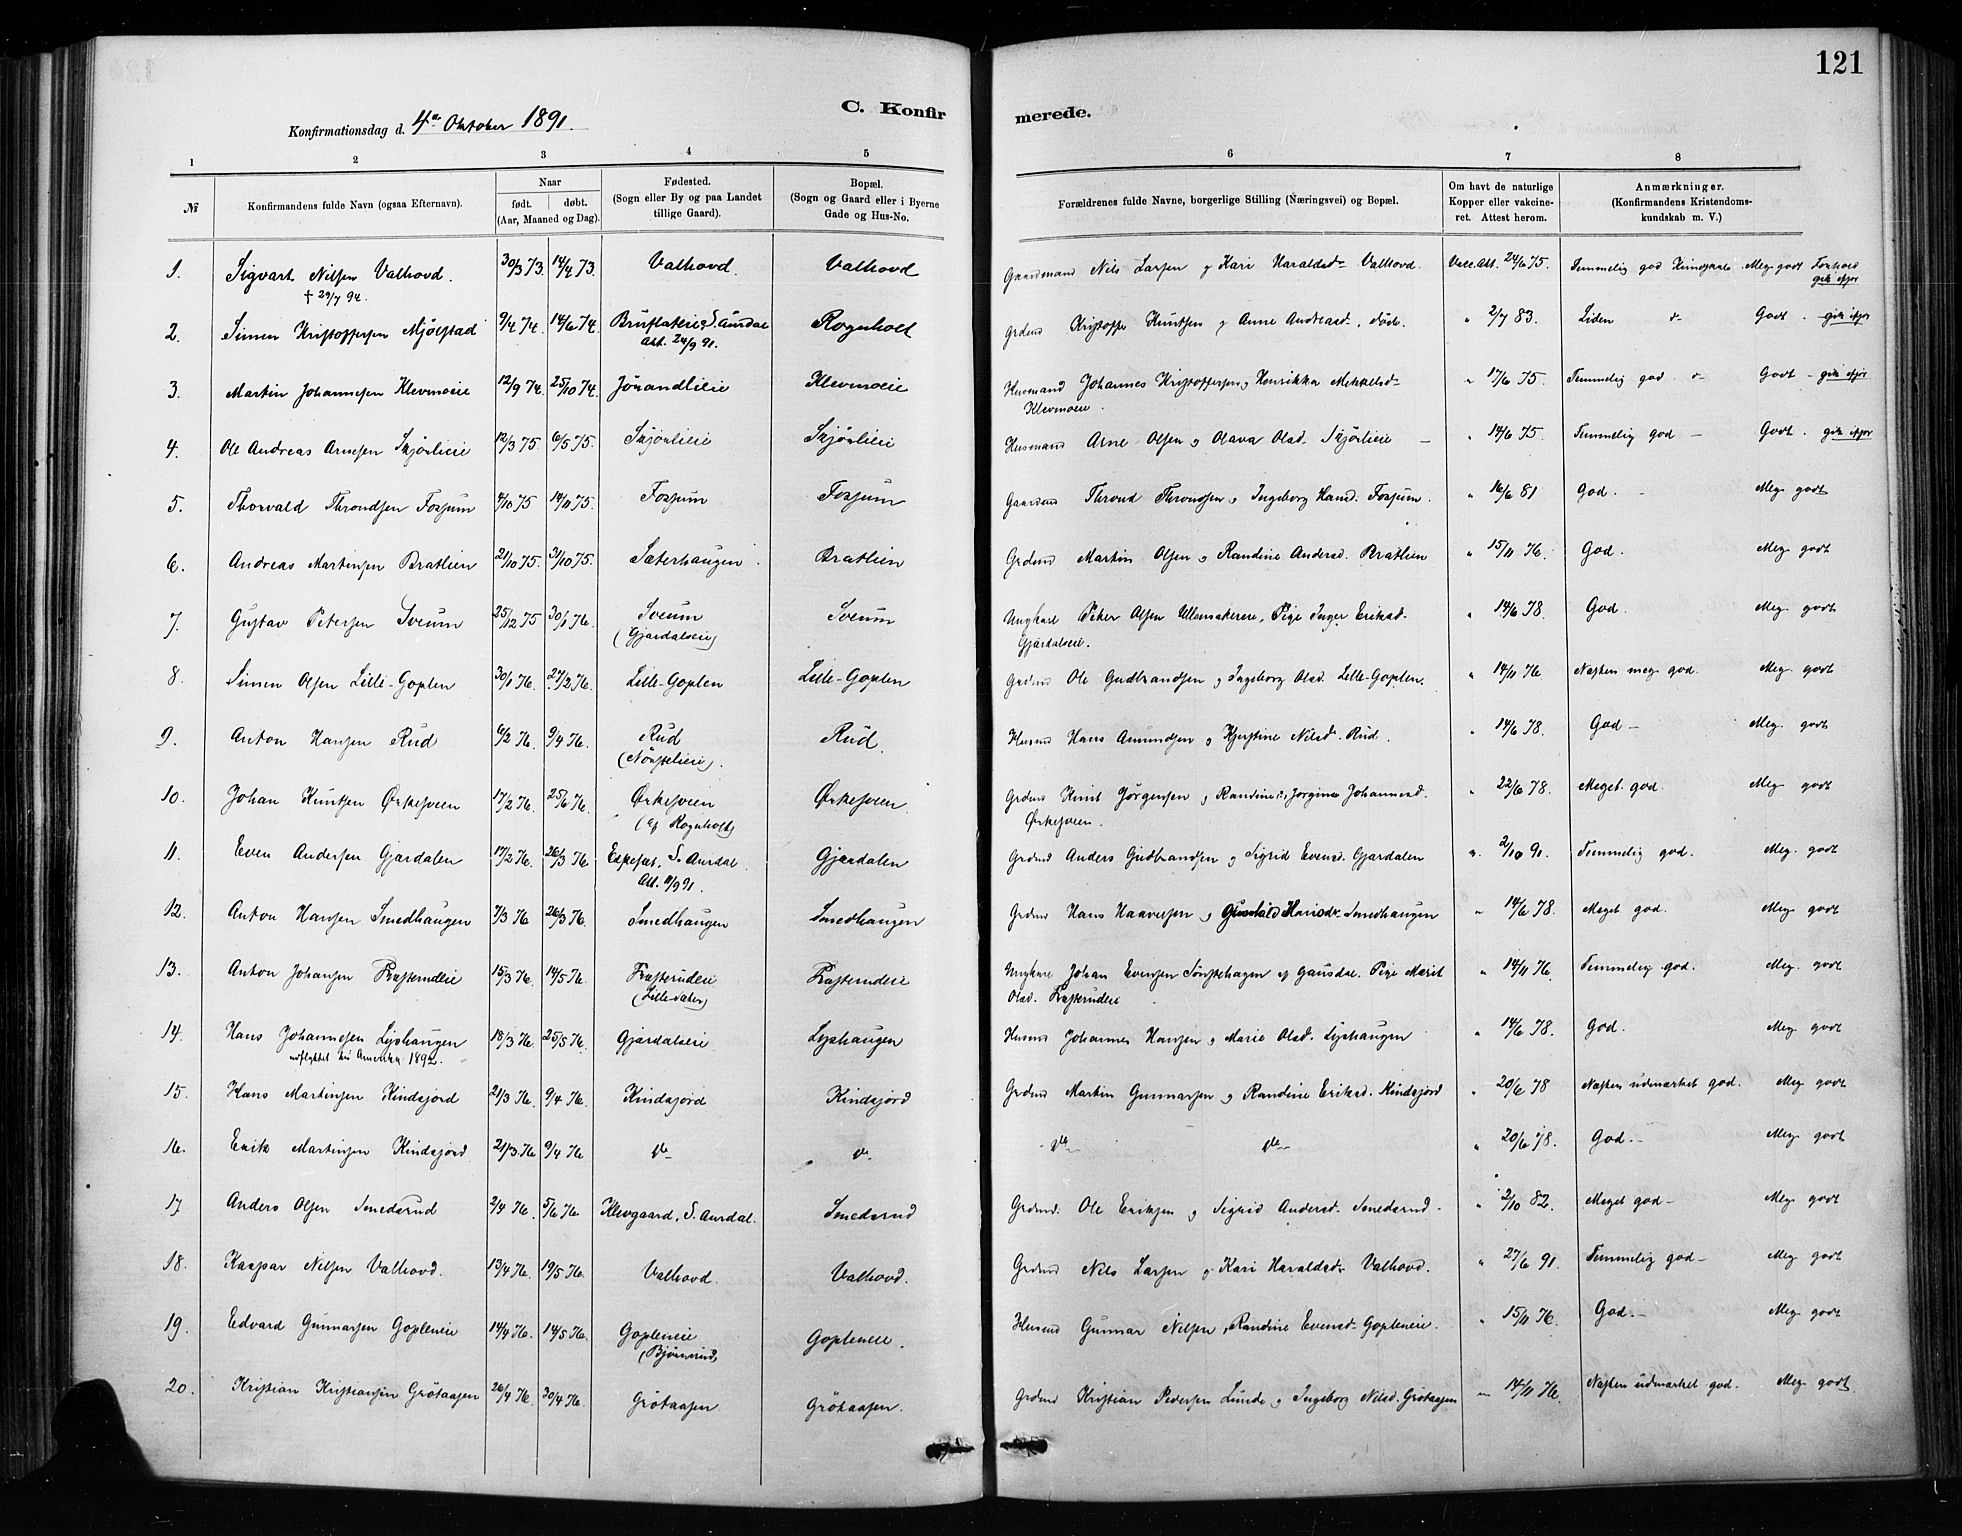 SAH, Nordre Land prestekontor, Ministerialbok nr. 4, 1882-1896, s. 121